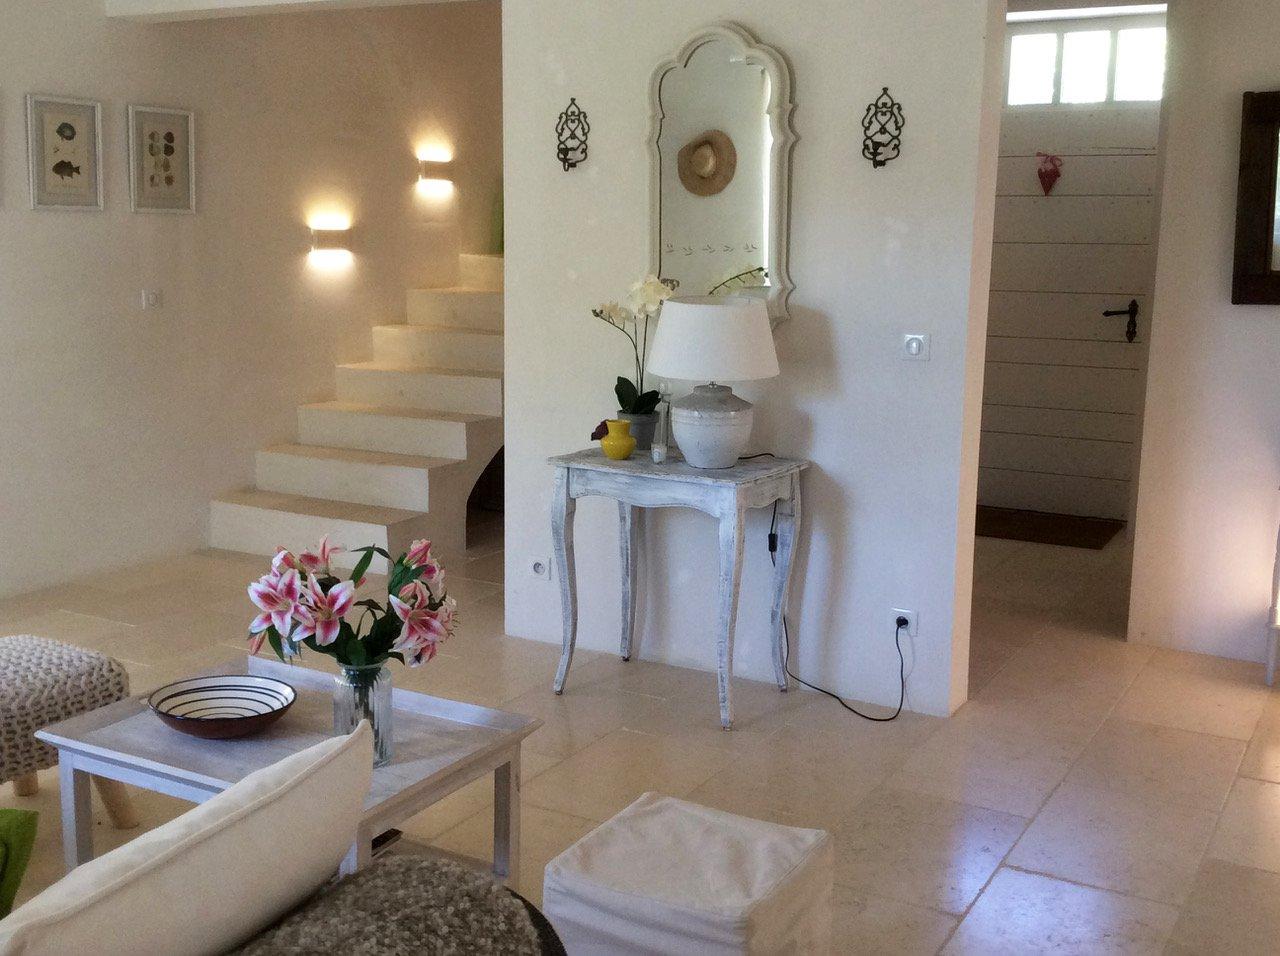 SILLANS LA CASCADE STONE NEW BASTIDE OF 230 M² WITH 4 BEDROOMS